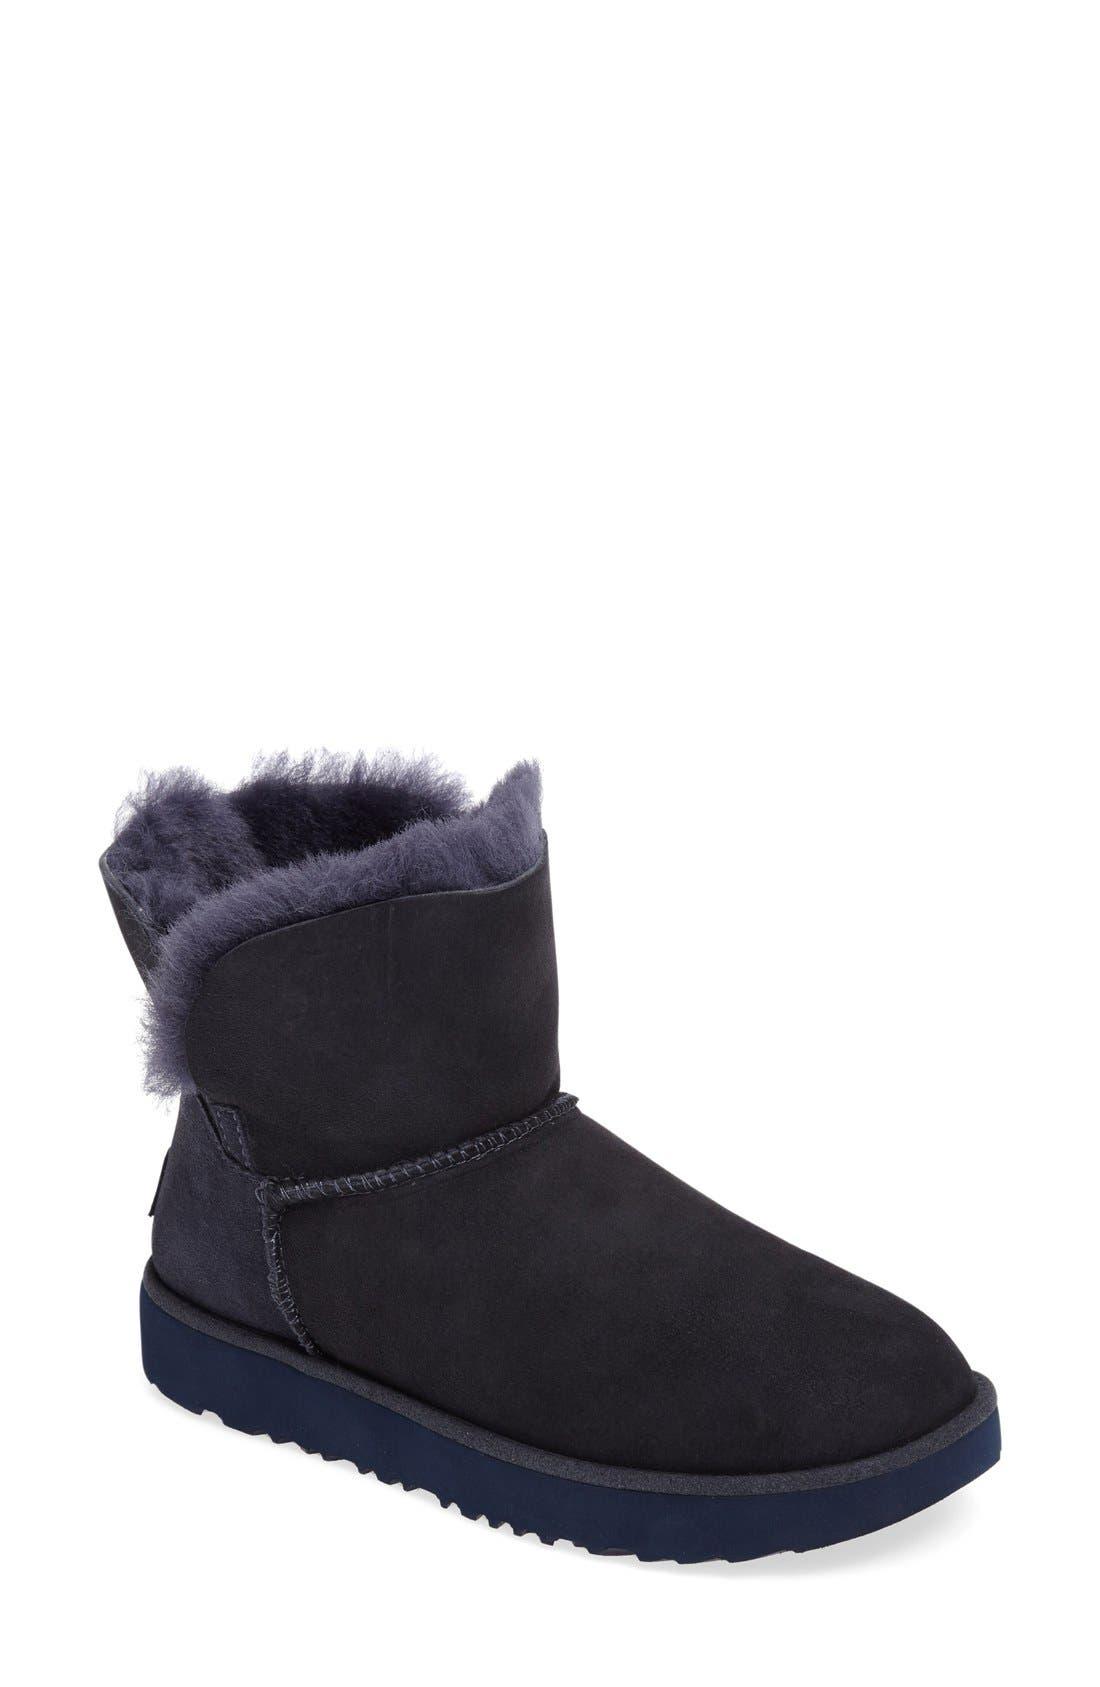 Main Image - UGG® Classic Cuff Mini Boot (Women)